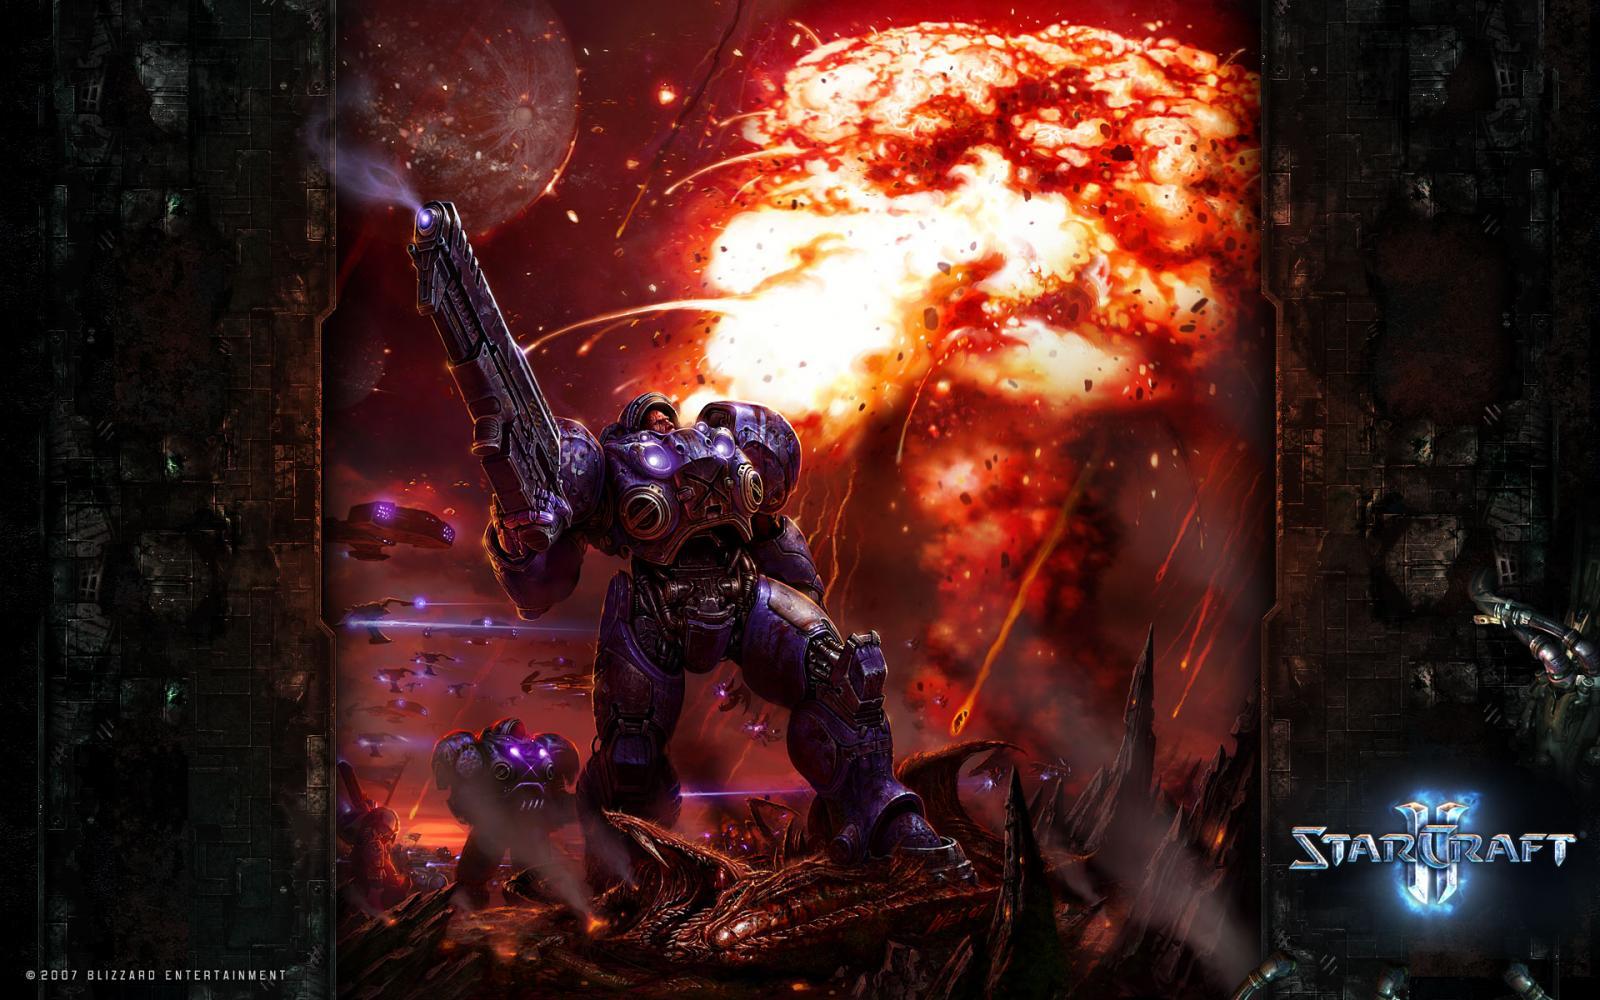 Wallpaper StarCraft 2 - Human vs Zerg Jeux video